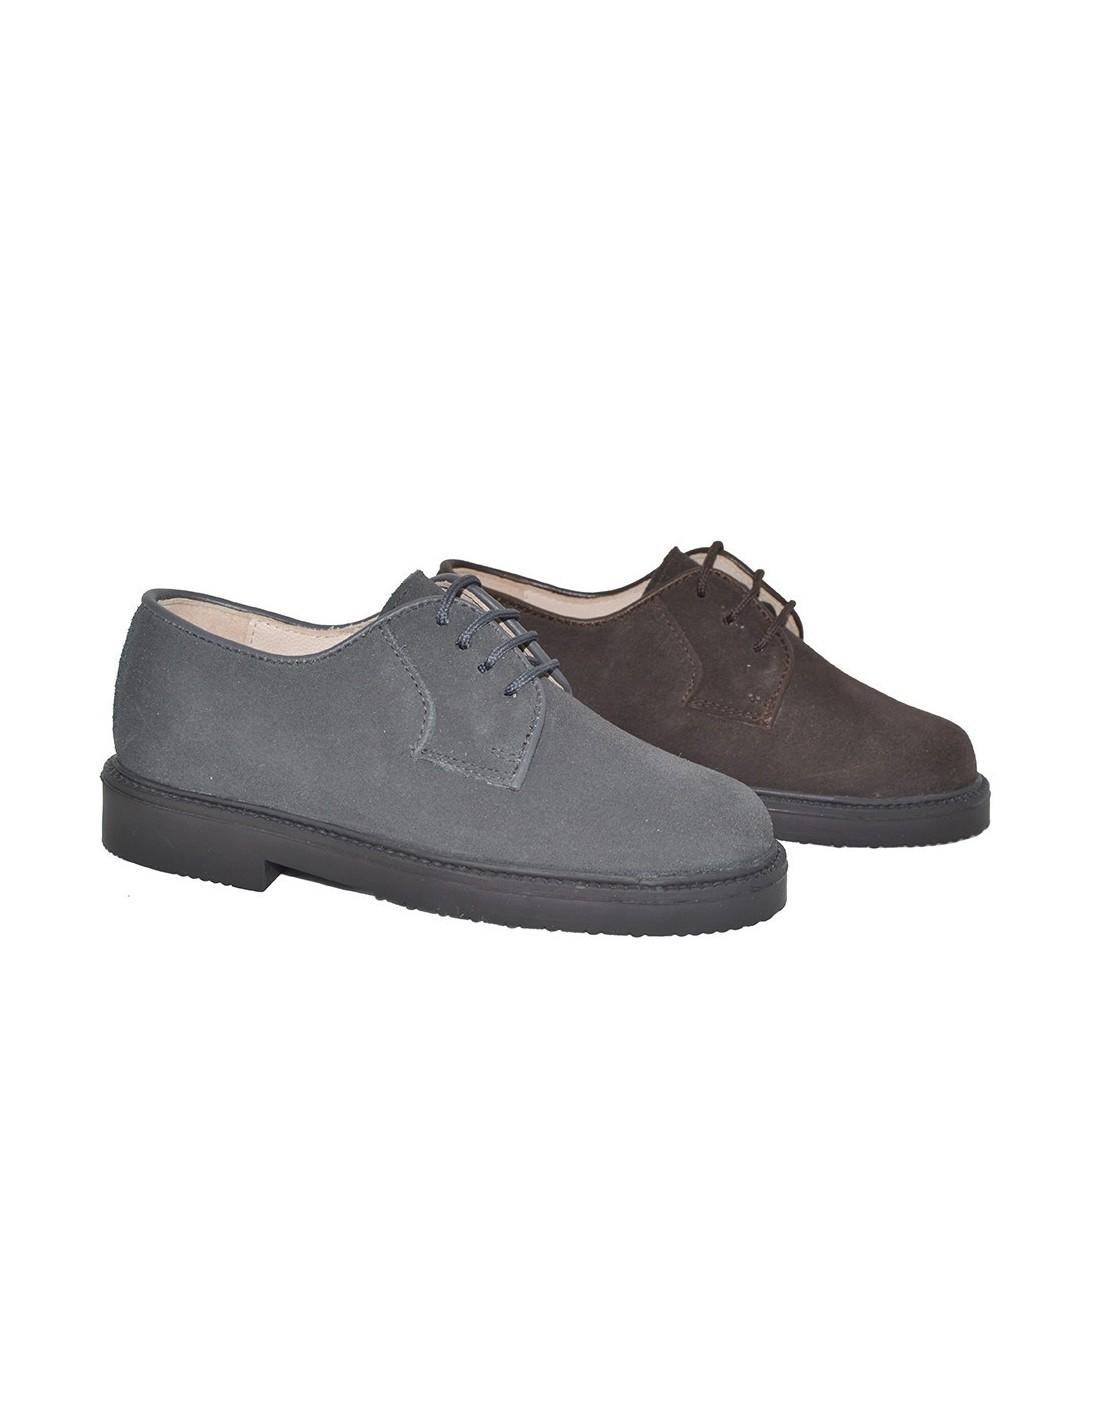 c1092e3da Zapato blucher clásico en serraje. Talla 32 Color CHOCOLATE